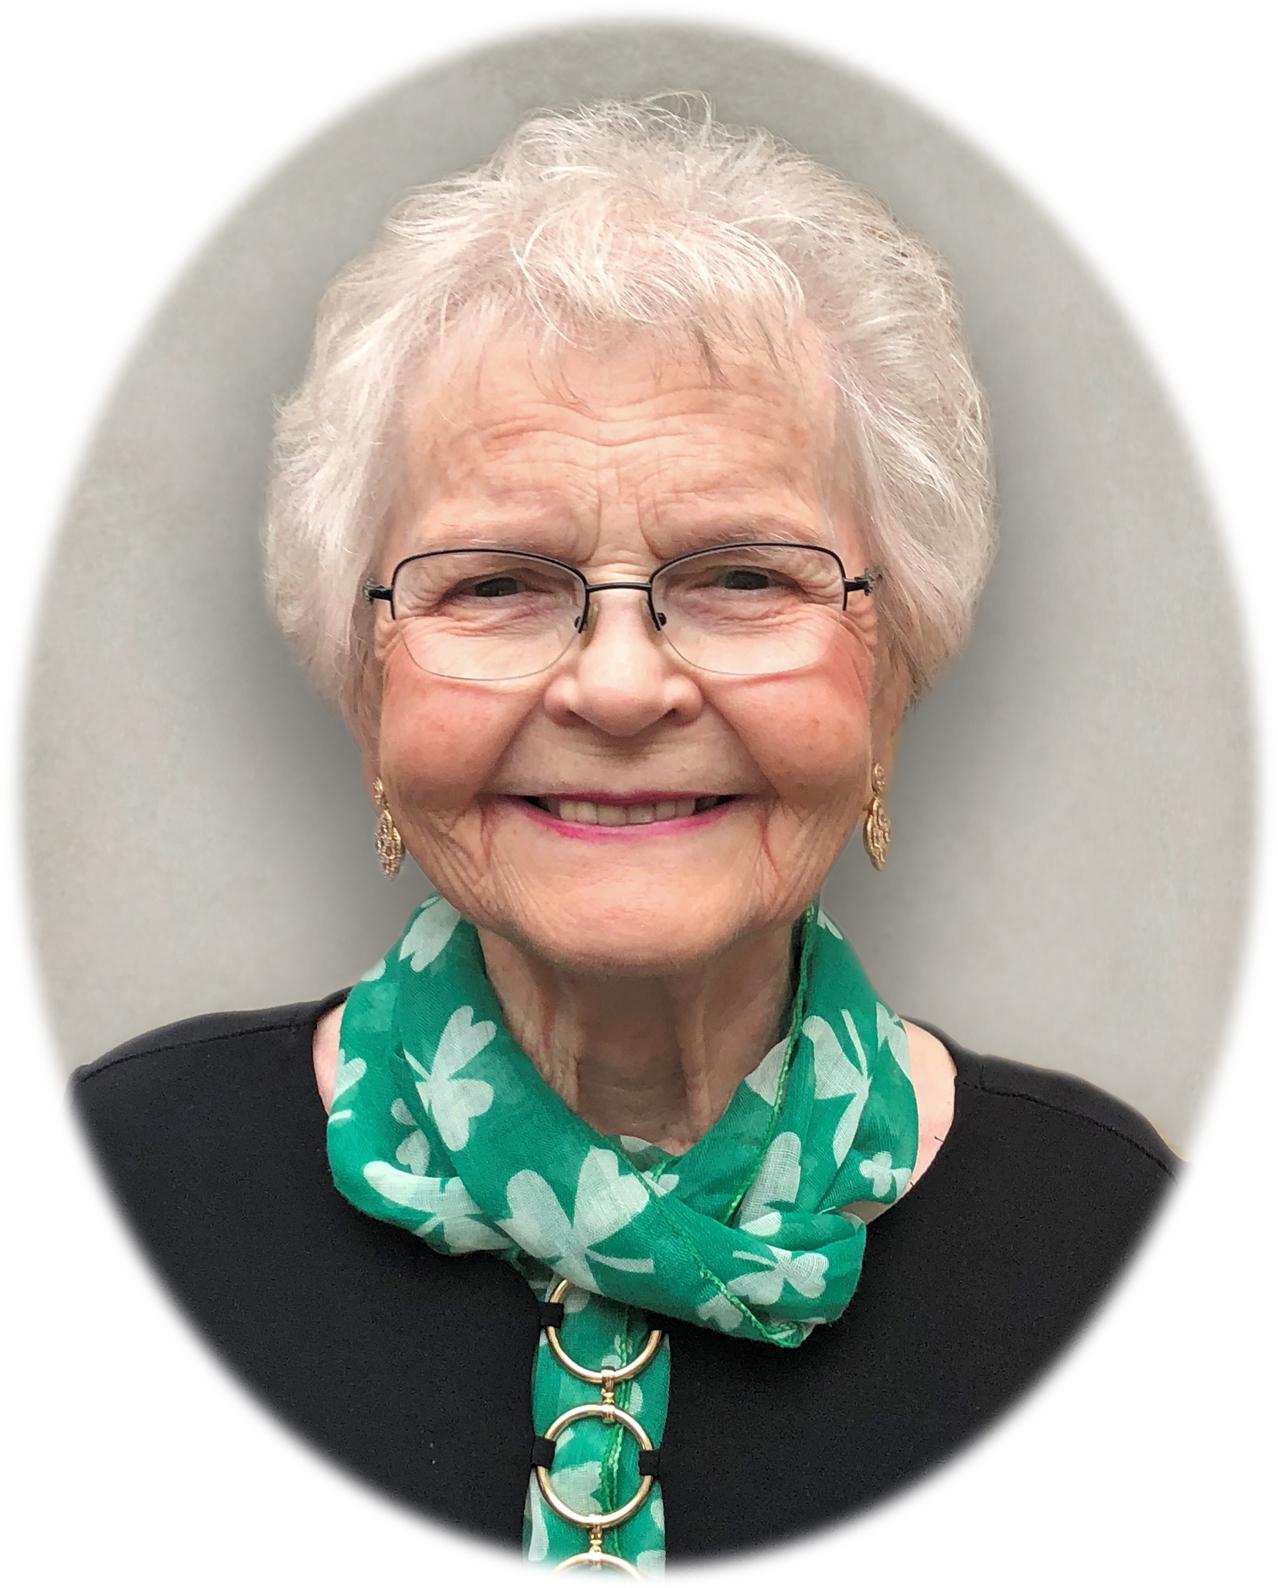 Mary Alice Pfeifer